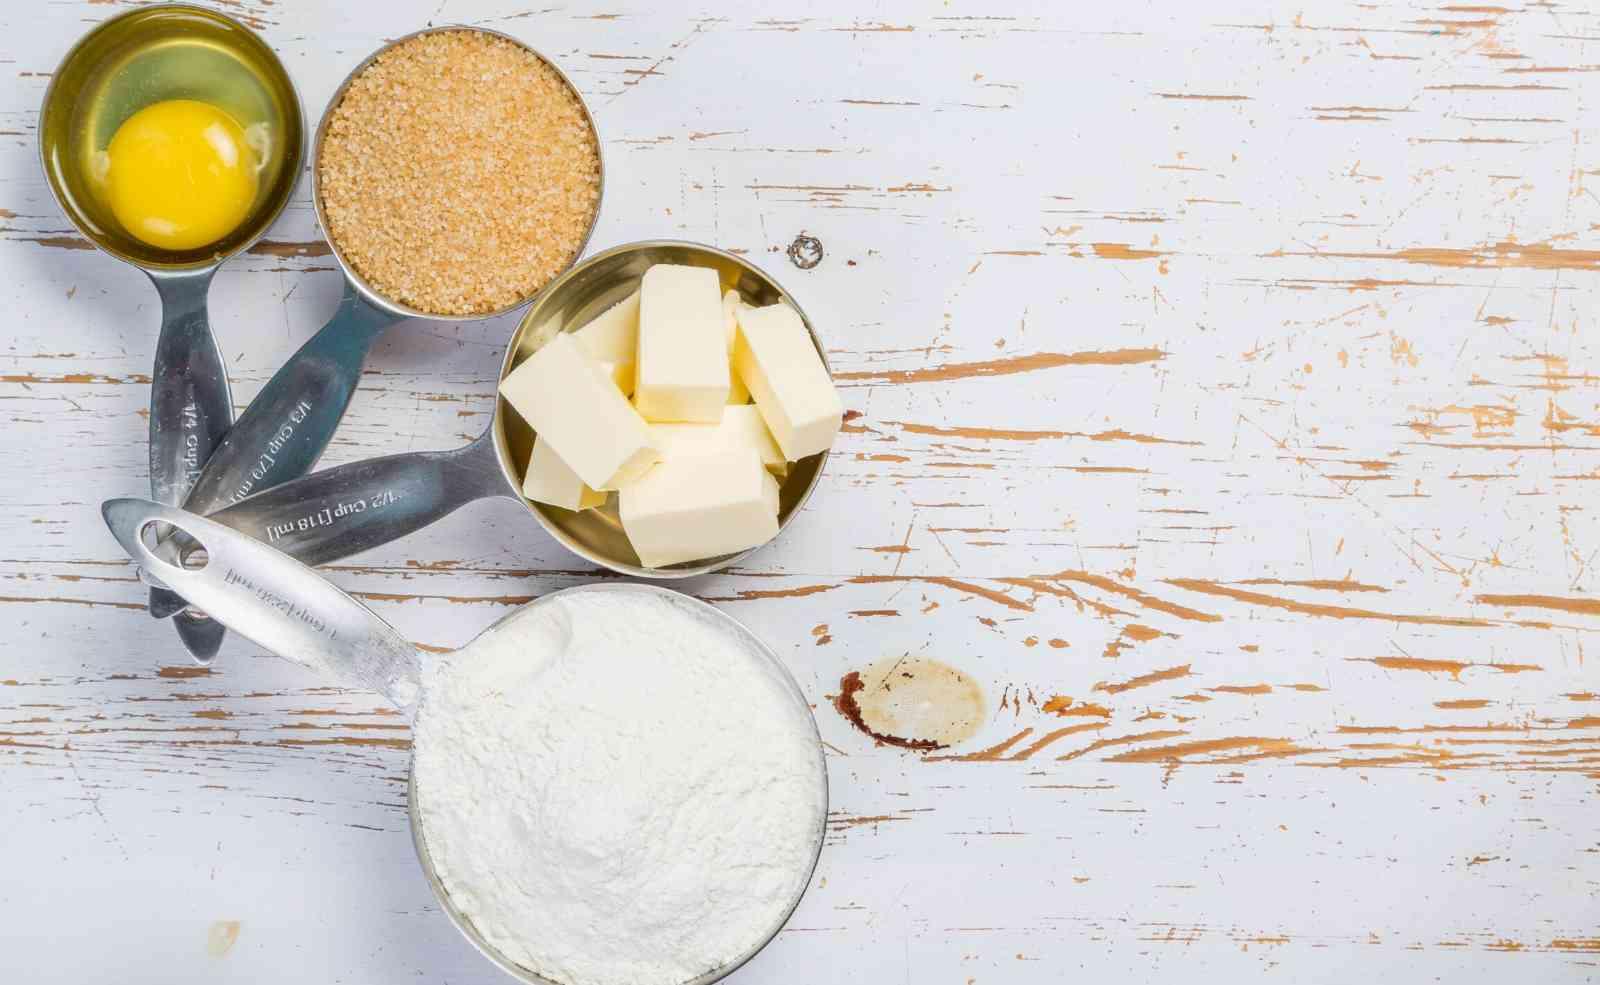 Umrechnung Becher Gramm Mehl, Zucker, Nüsse, Butter, Öl, Kakao - amerikanische Cups